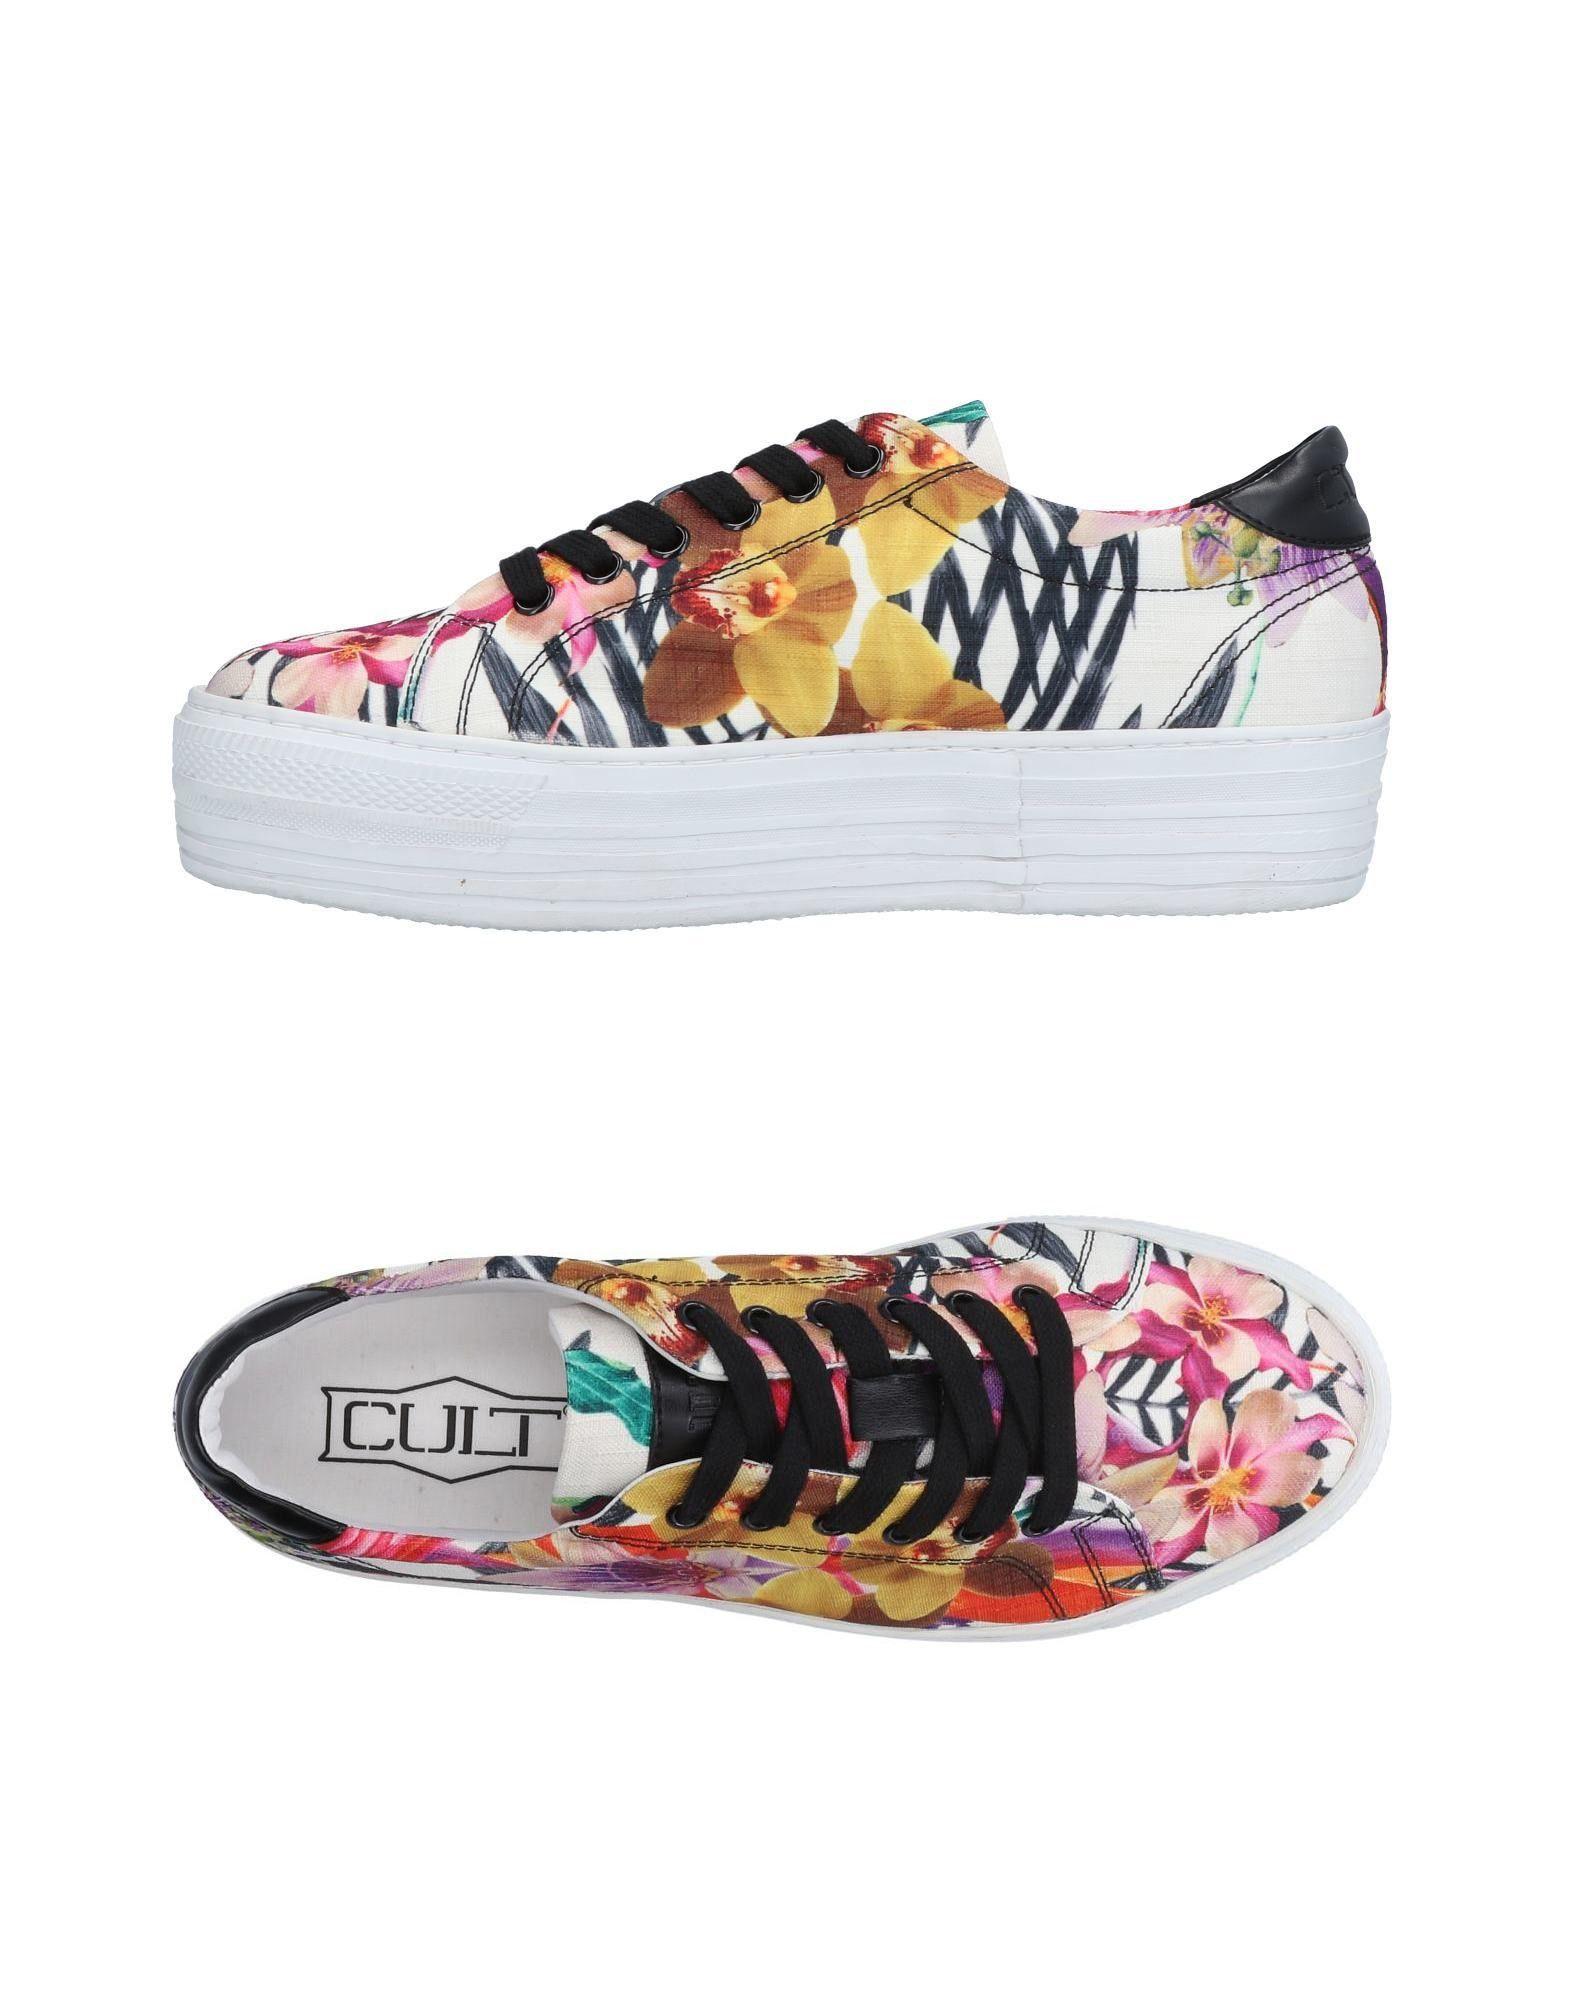 Moda Sneakers Cult Donna - 11503463GP